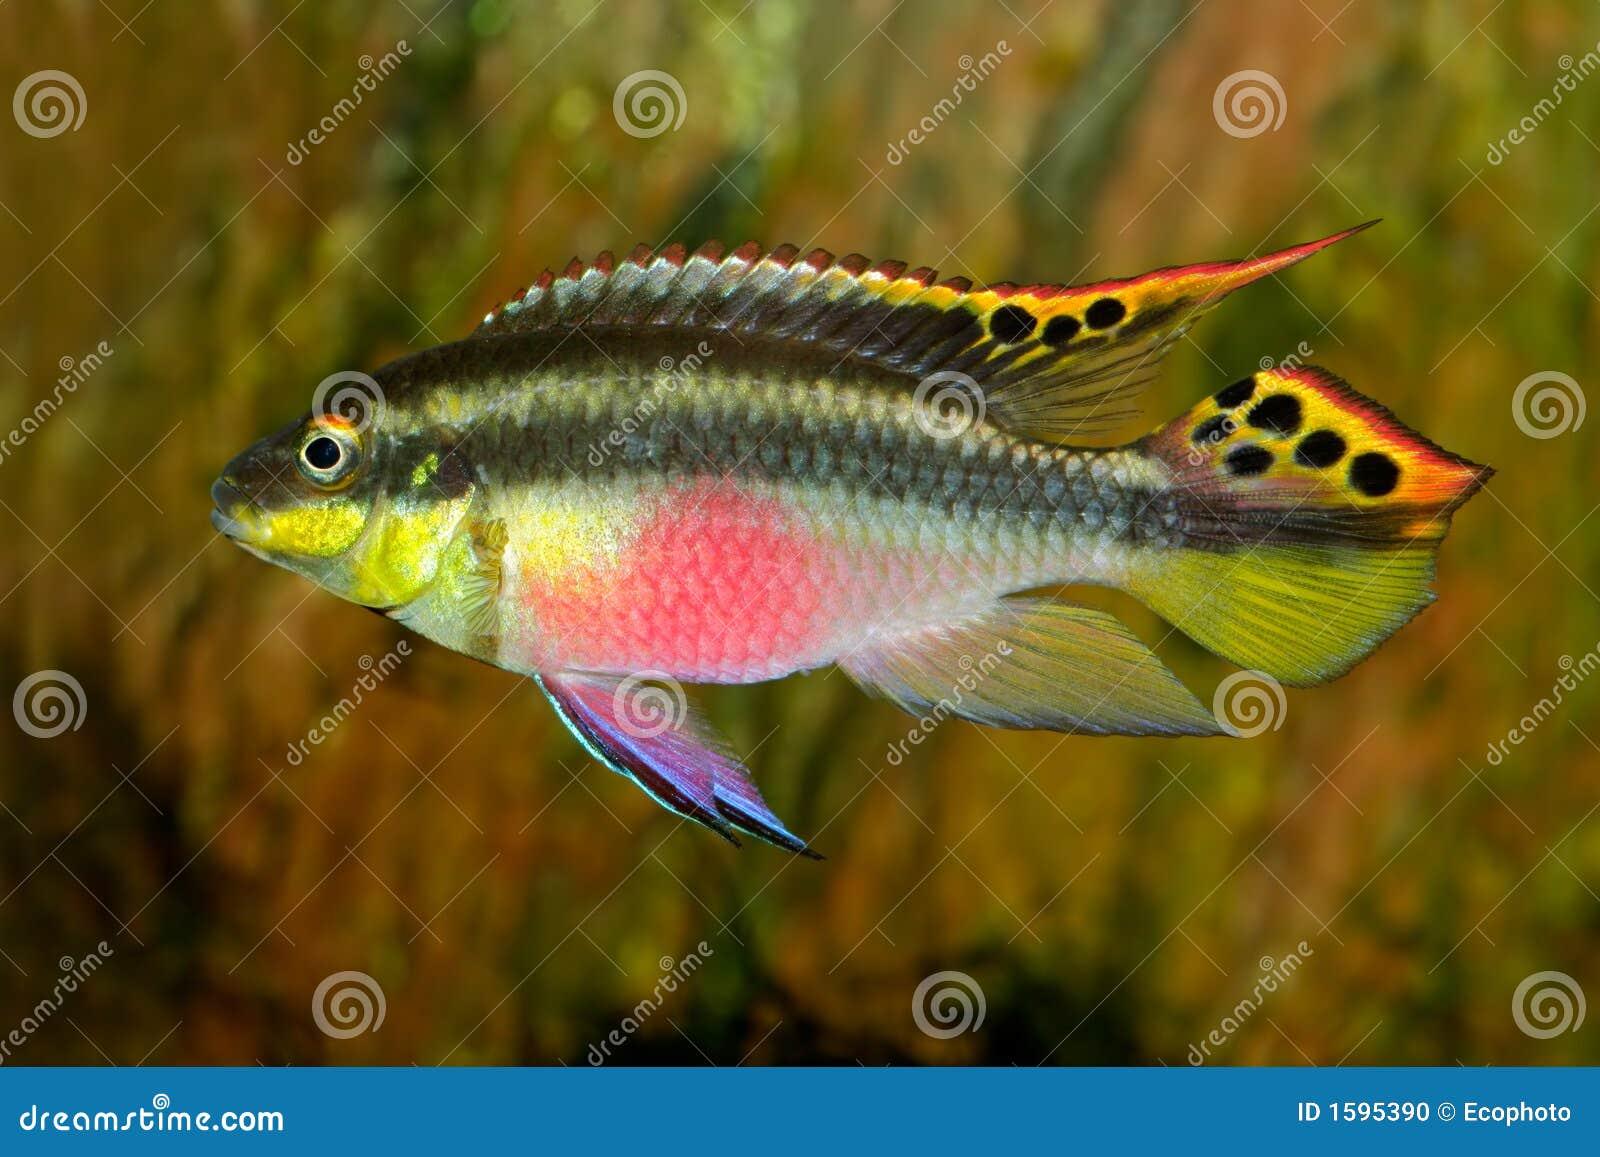 Colorful kribensis or purple cichlid (Pelvicachromis pulcher) from ...